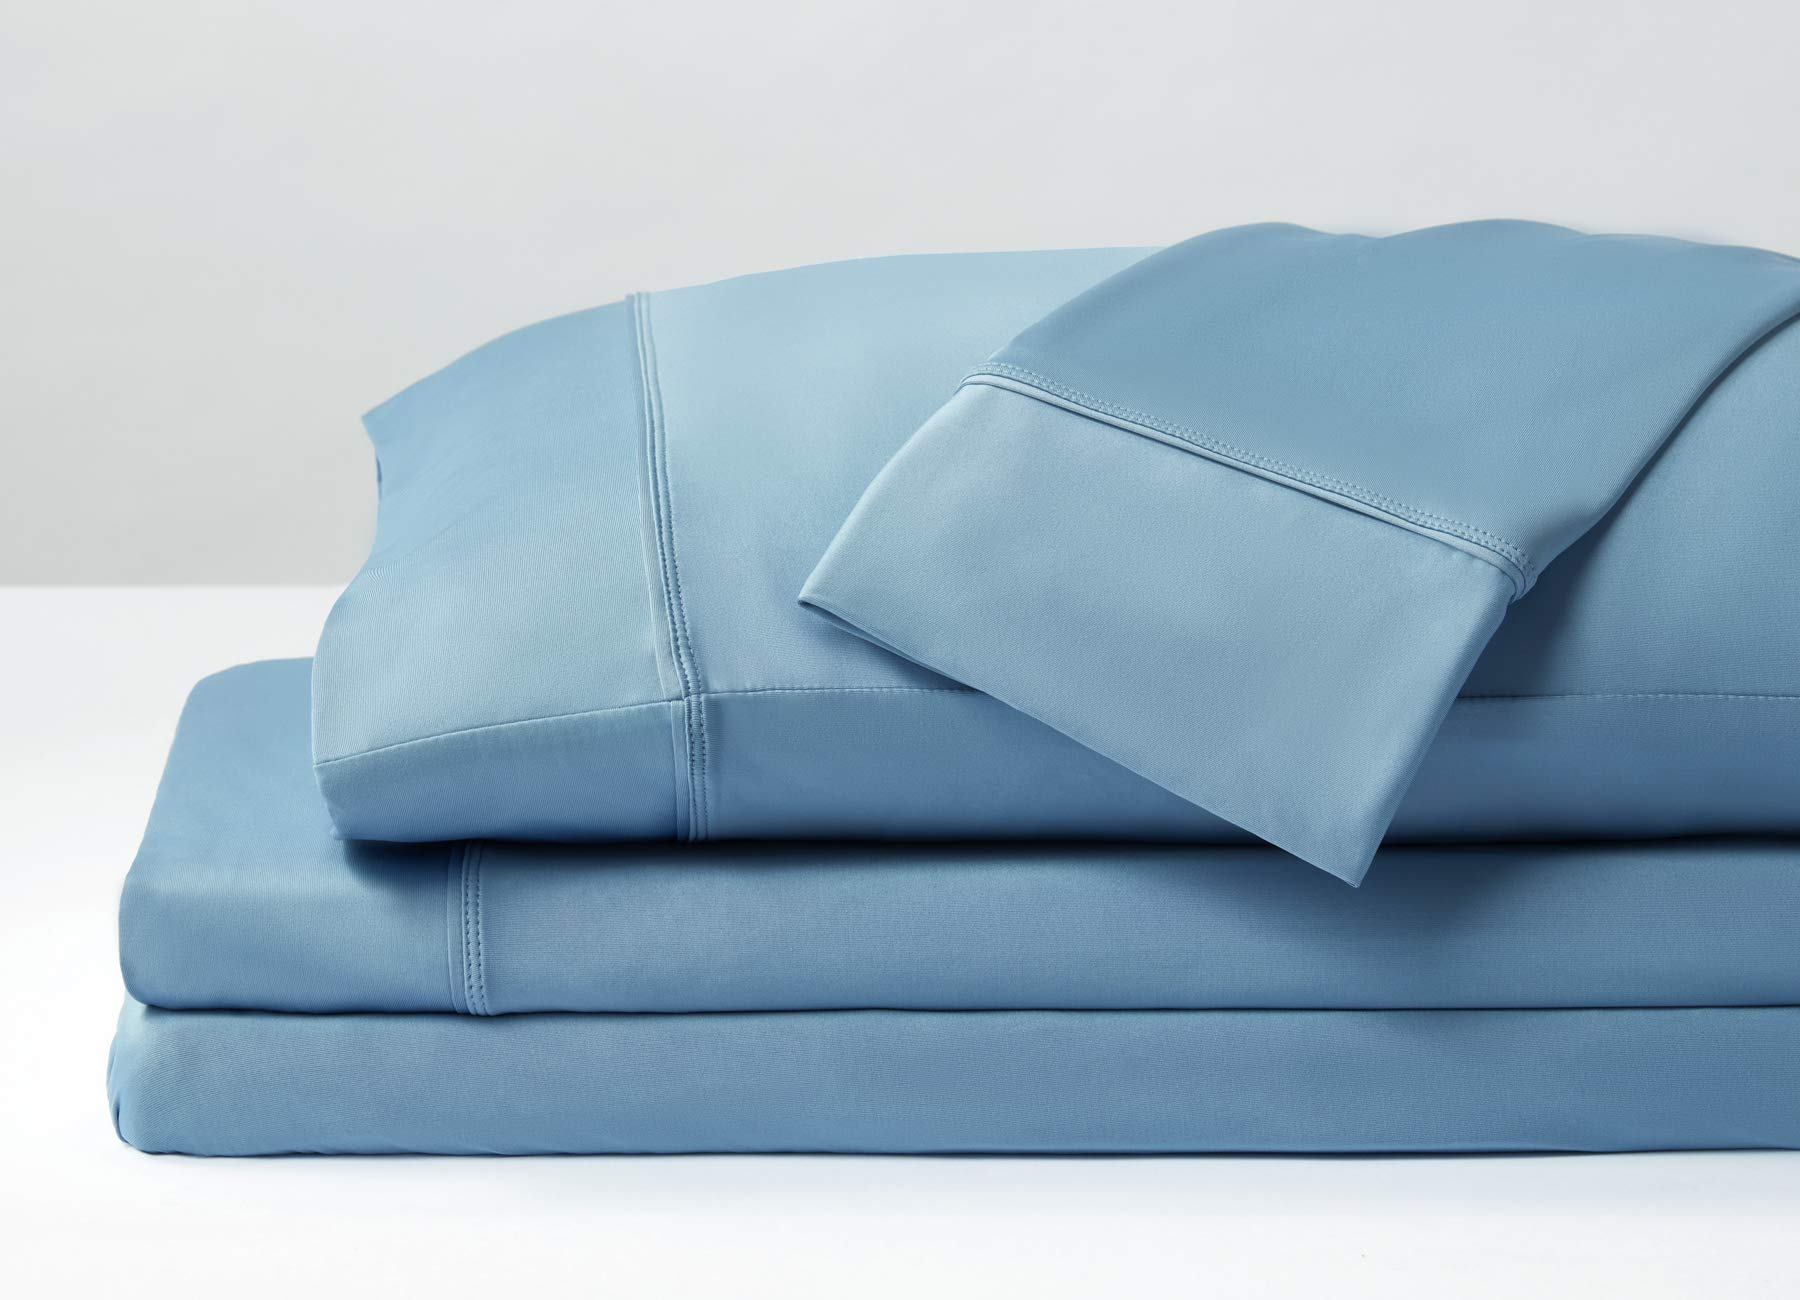 SHEEX Original Performance Sheet Set with 2 Pillowcases, Ultra-Soft Fabric, Carolina Blue, Queen by SHEEX